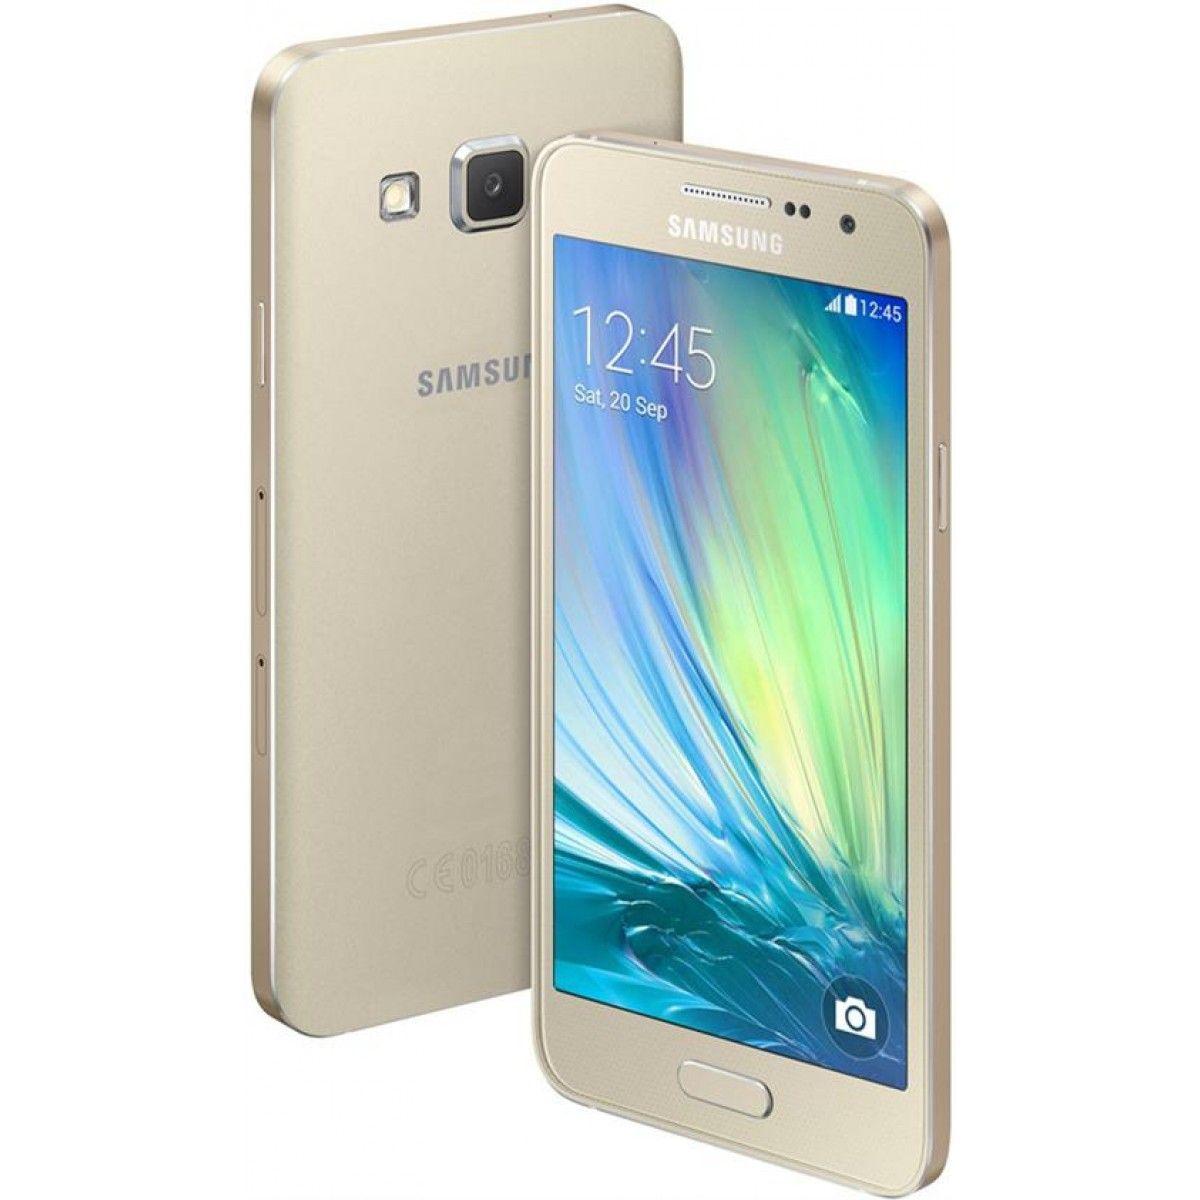 Nokia xl price nigeria - Samsung Galaxy A5 Price In Nigeria